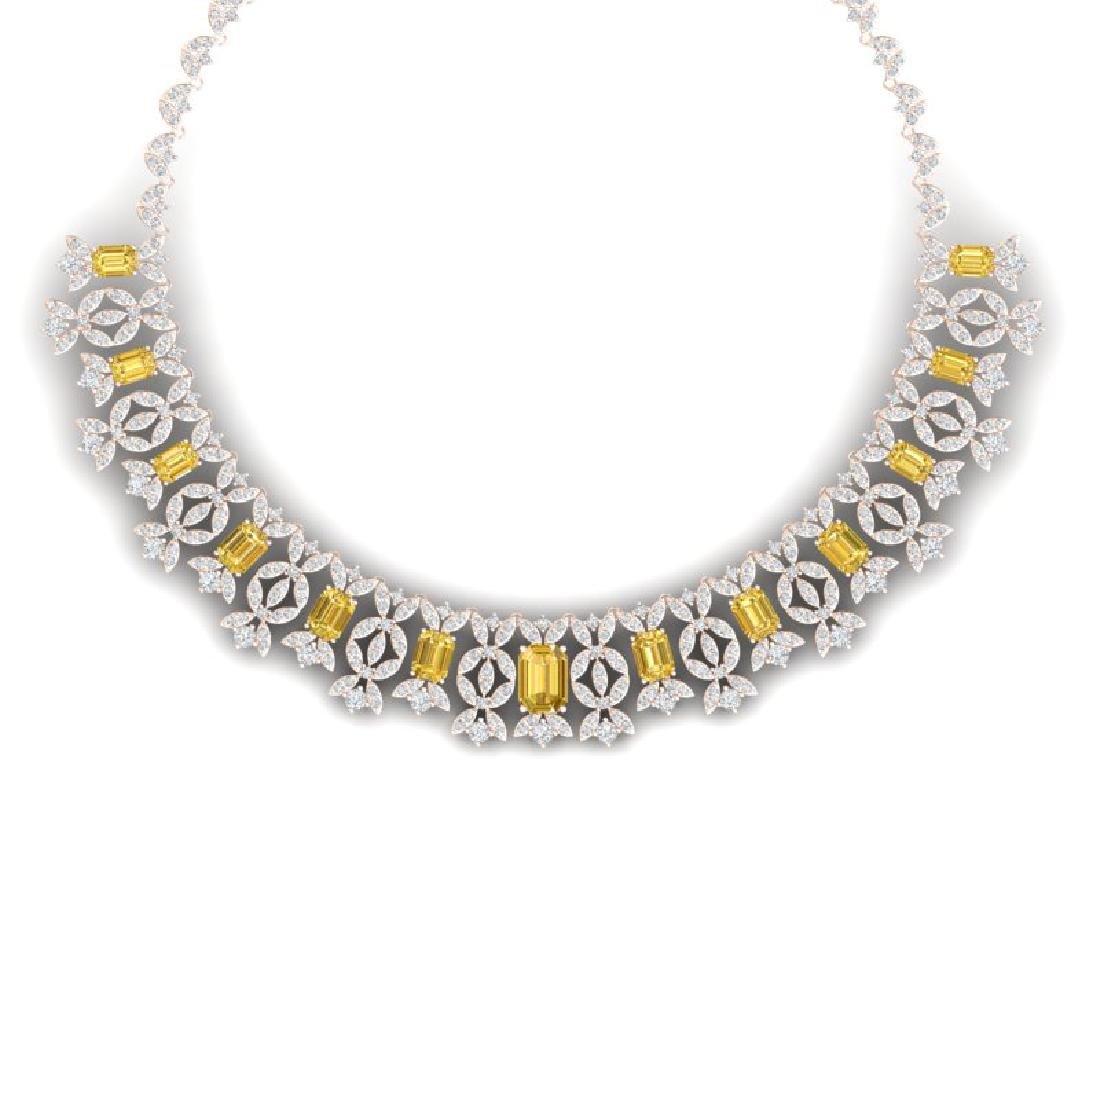 46.38 CTW Royalty Canary Citrine & VS Diamond Necklace